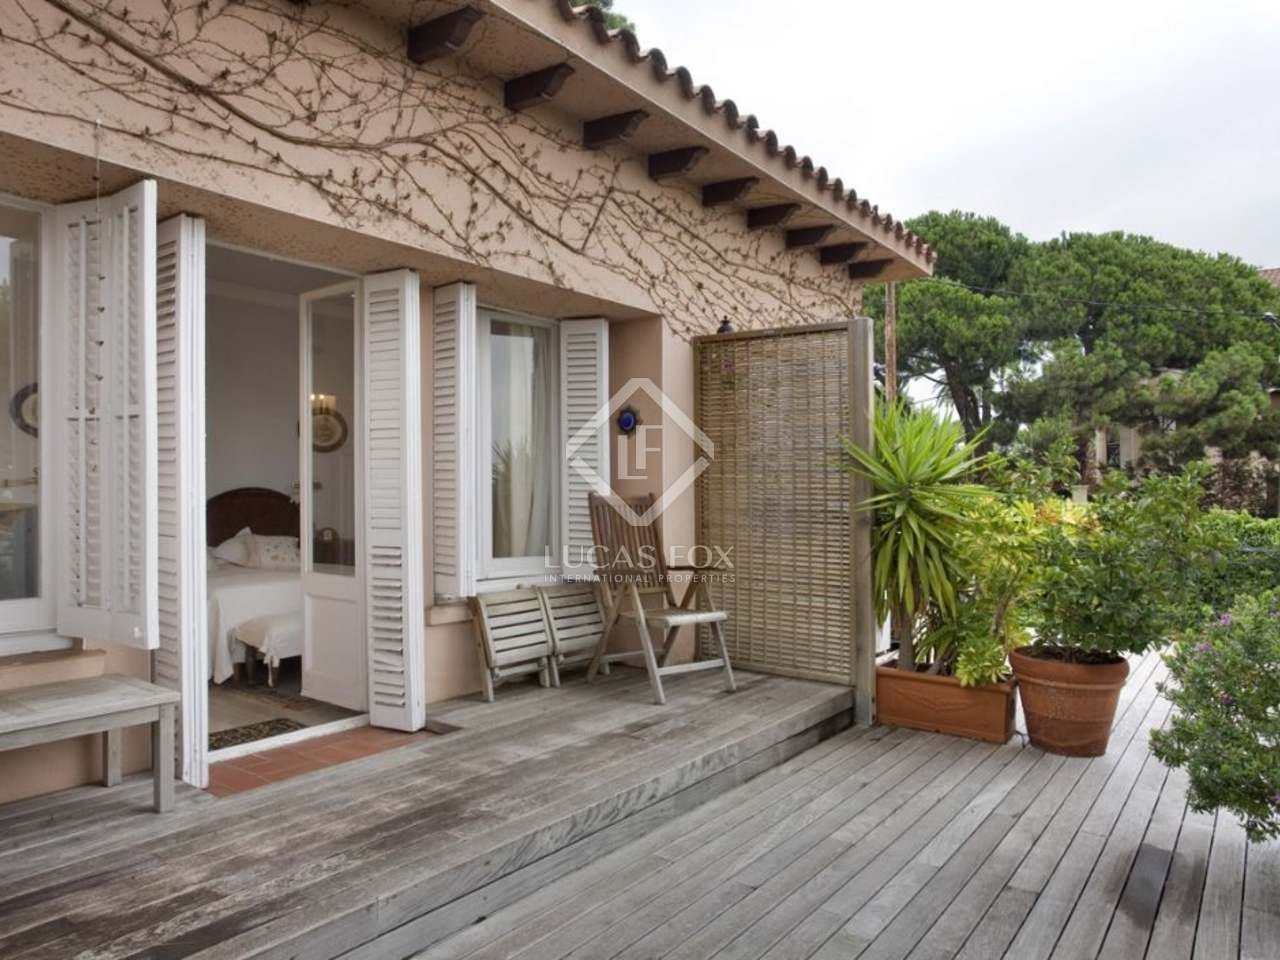 maison villa de 425m a vendre pedralbes barcelone. Black Bedroom Furniture Sets. Home Design Ideas